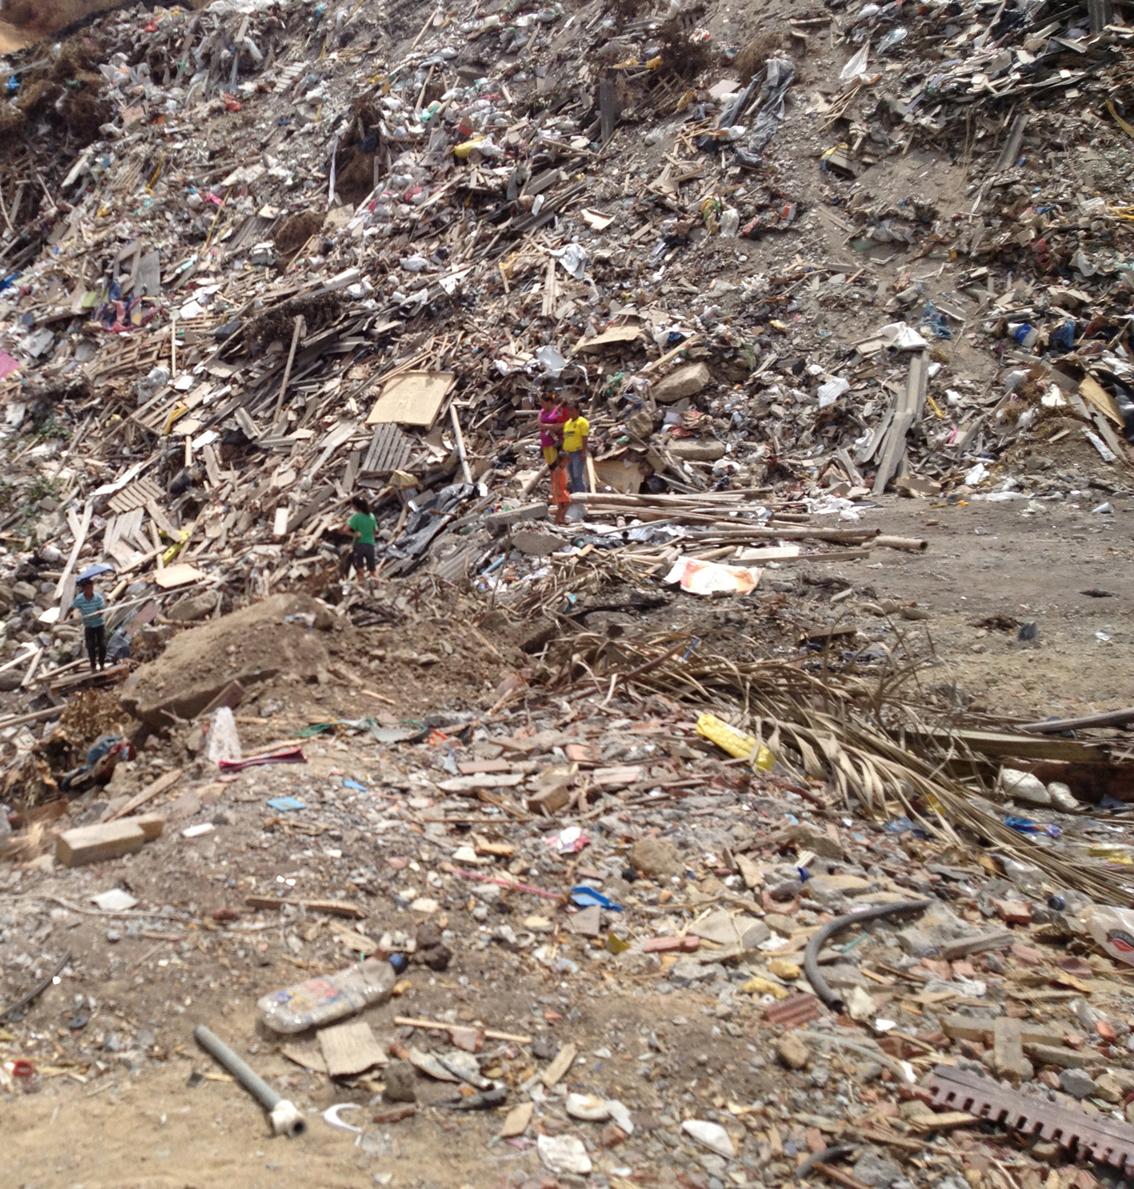 23Sergio Toral dump_Guayaquil Ecuador.jpg